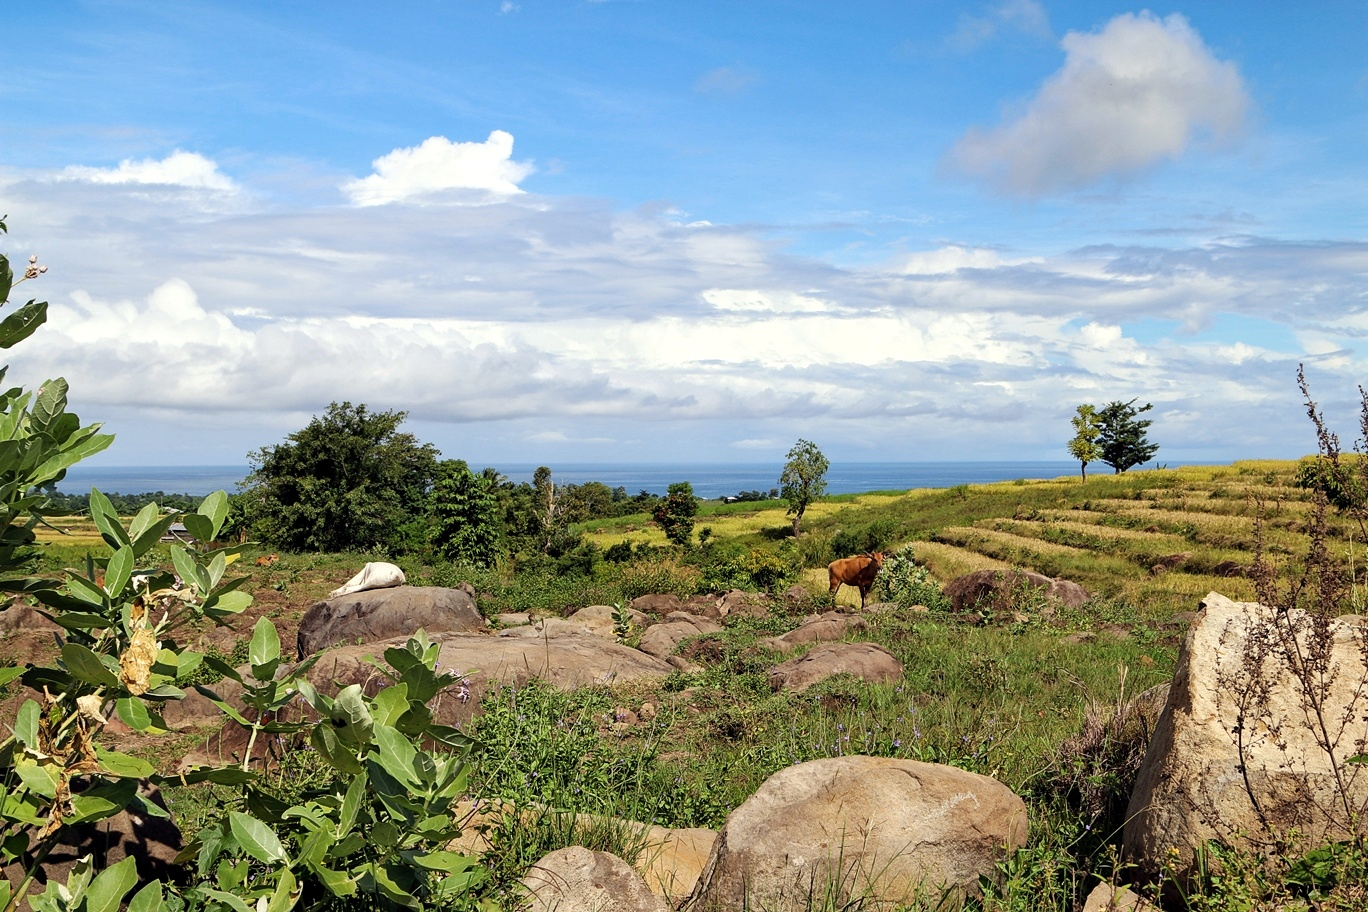 Pemandangan tipikal daerah Timur Indonesia